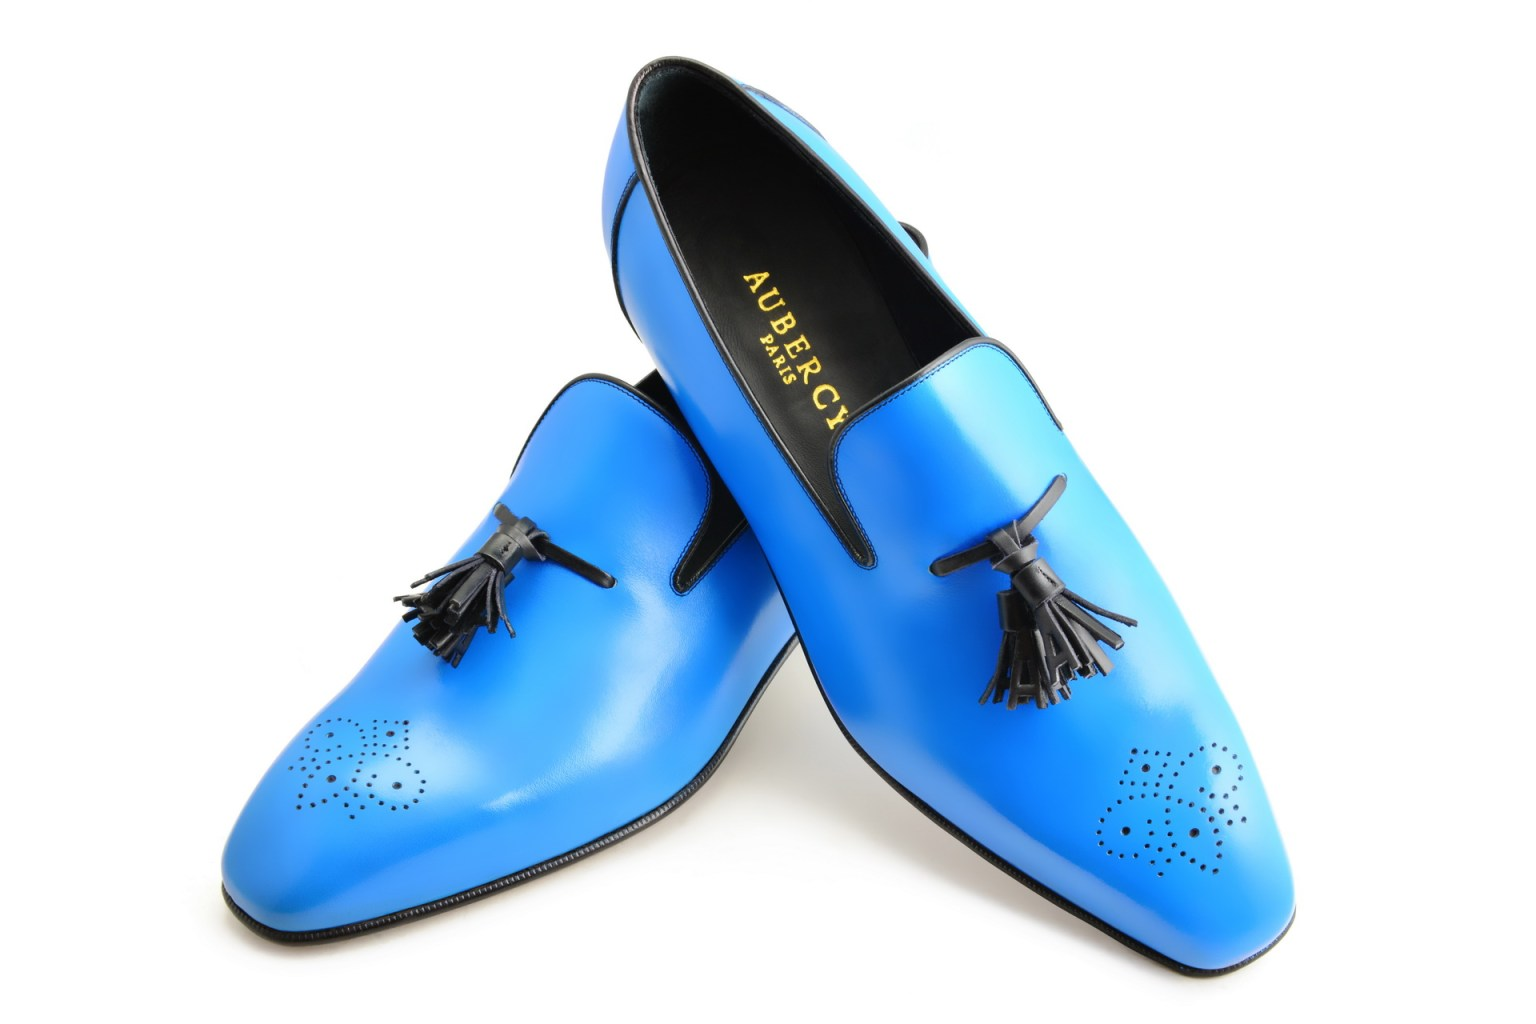 Le mocassin loafer Solal en cuir bleu de France et pompons noirs